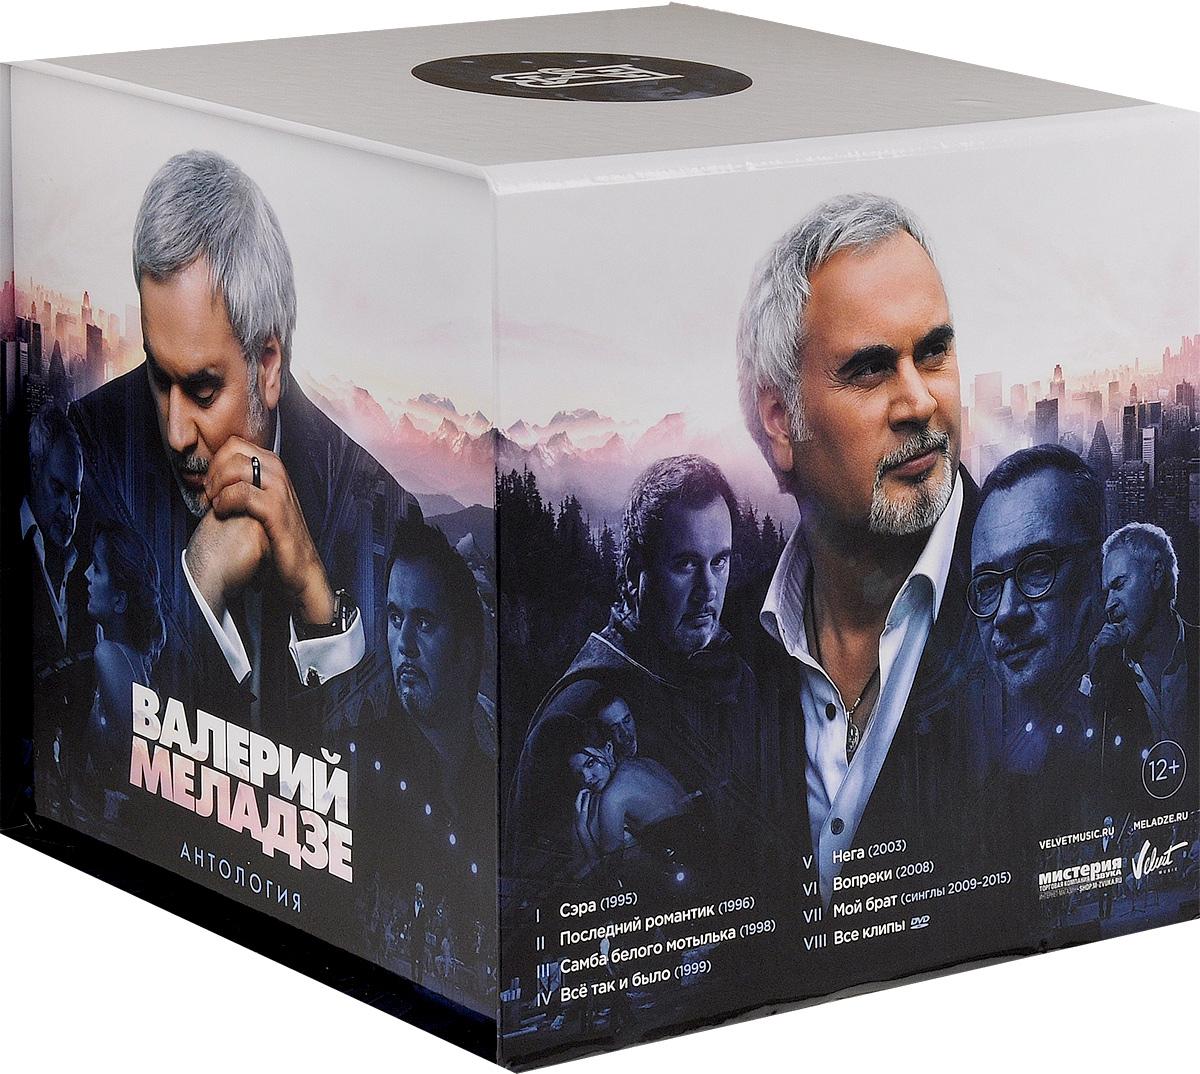 Валерий Меладзе. Антология (7 CD + DVD)